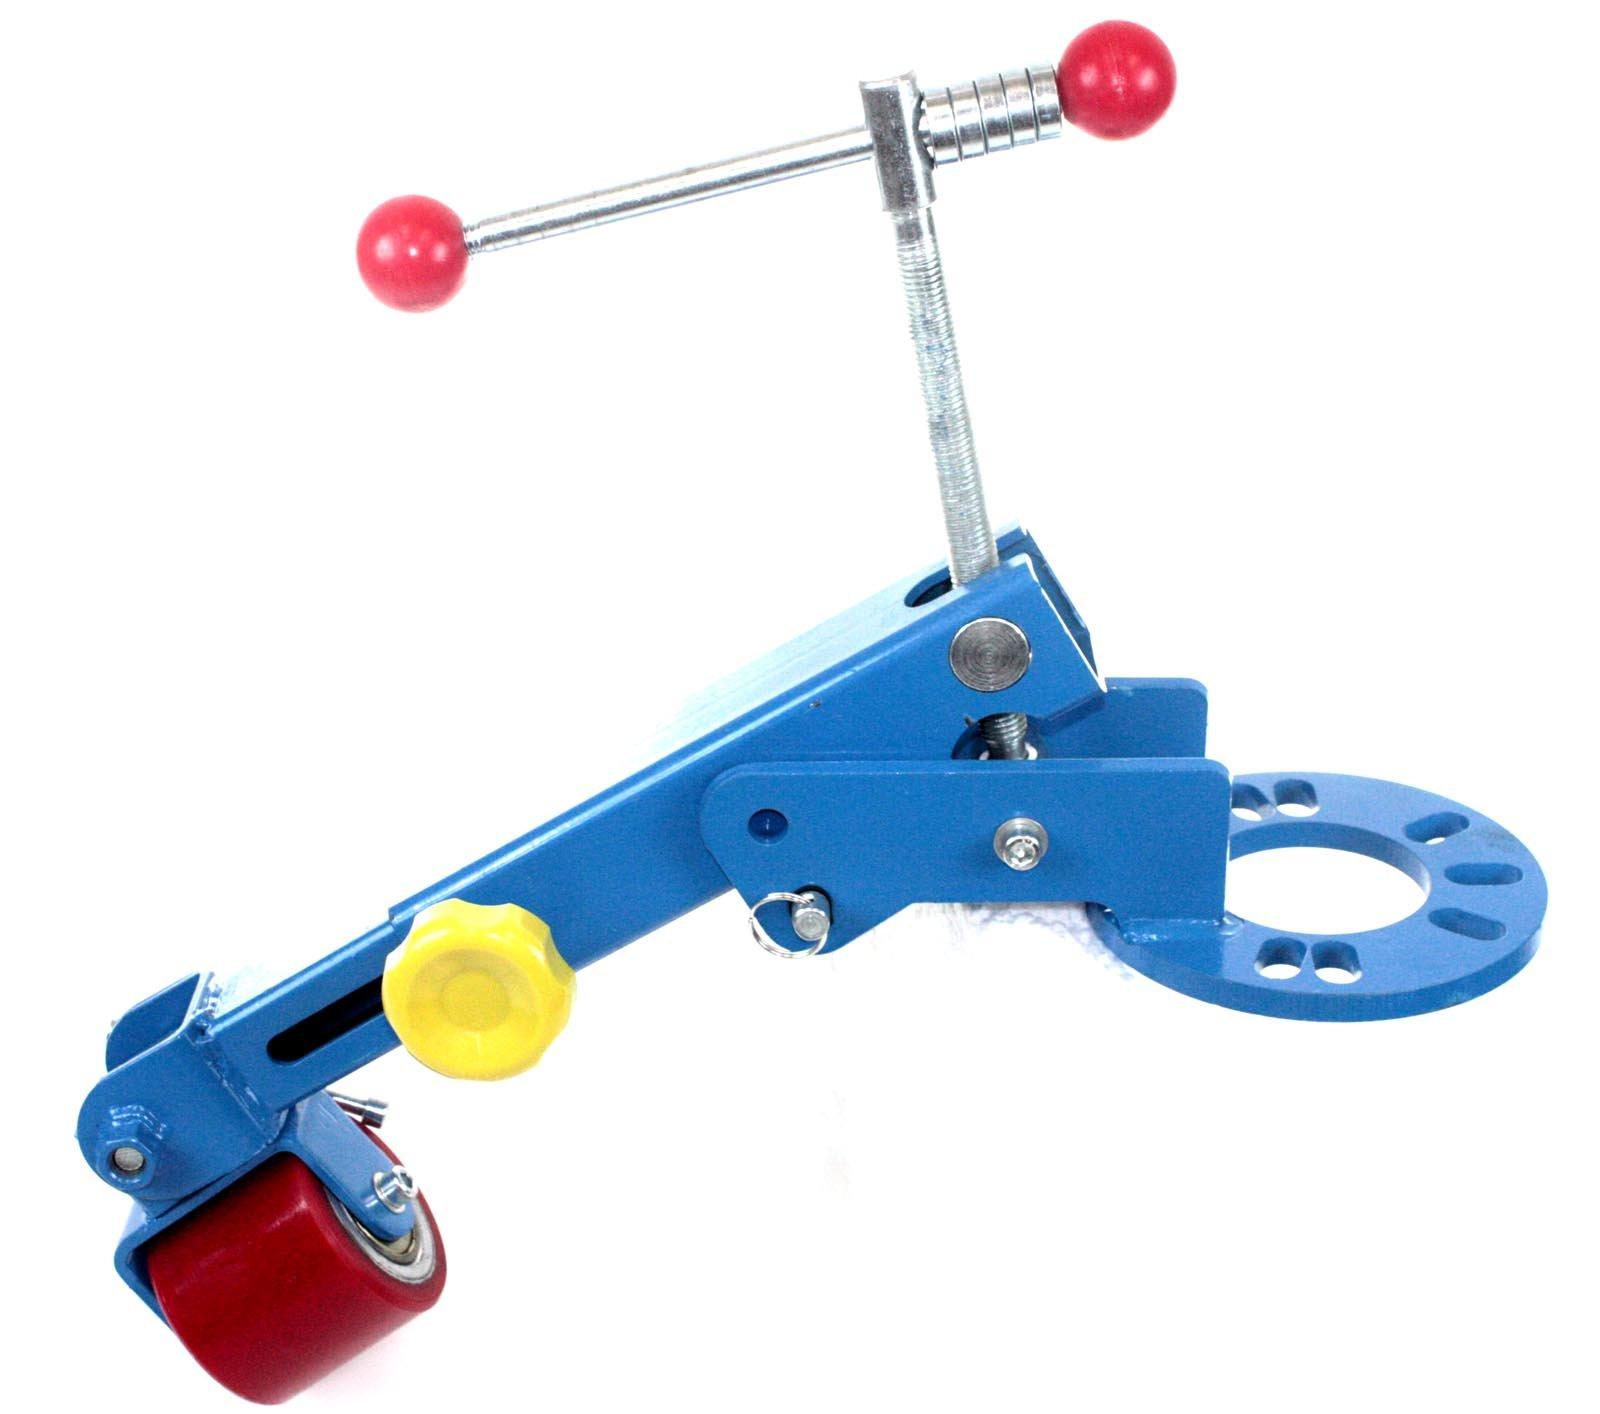 Jtc Fender Roller Tool Lip Rolling Extending Tools Auto Body Shop